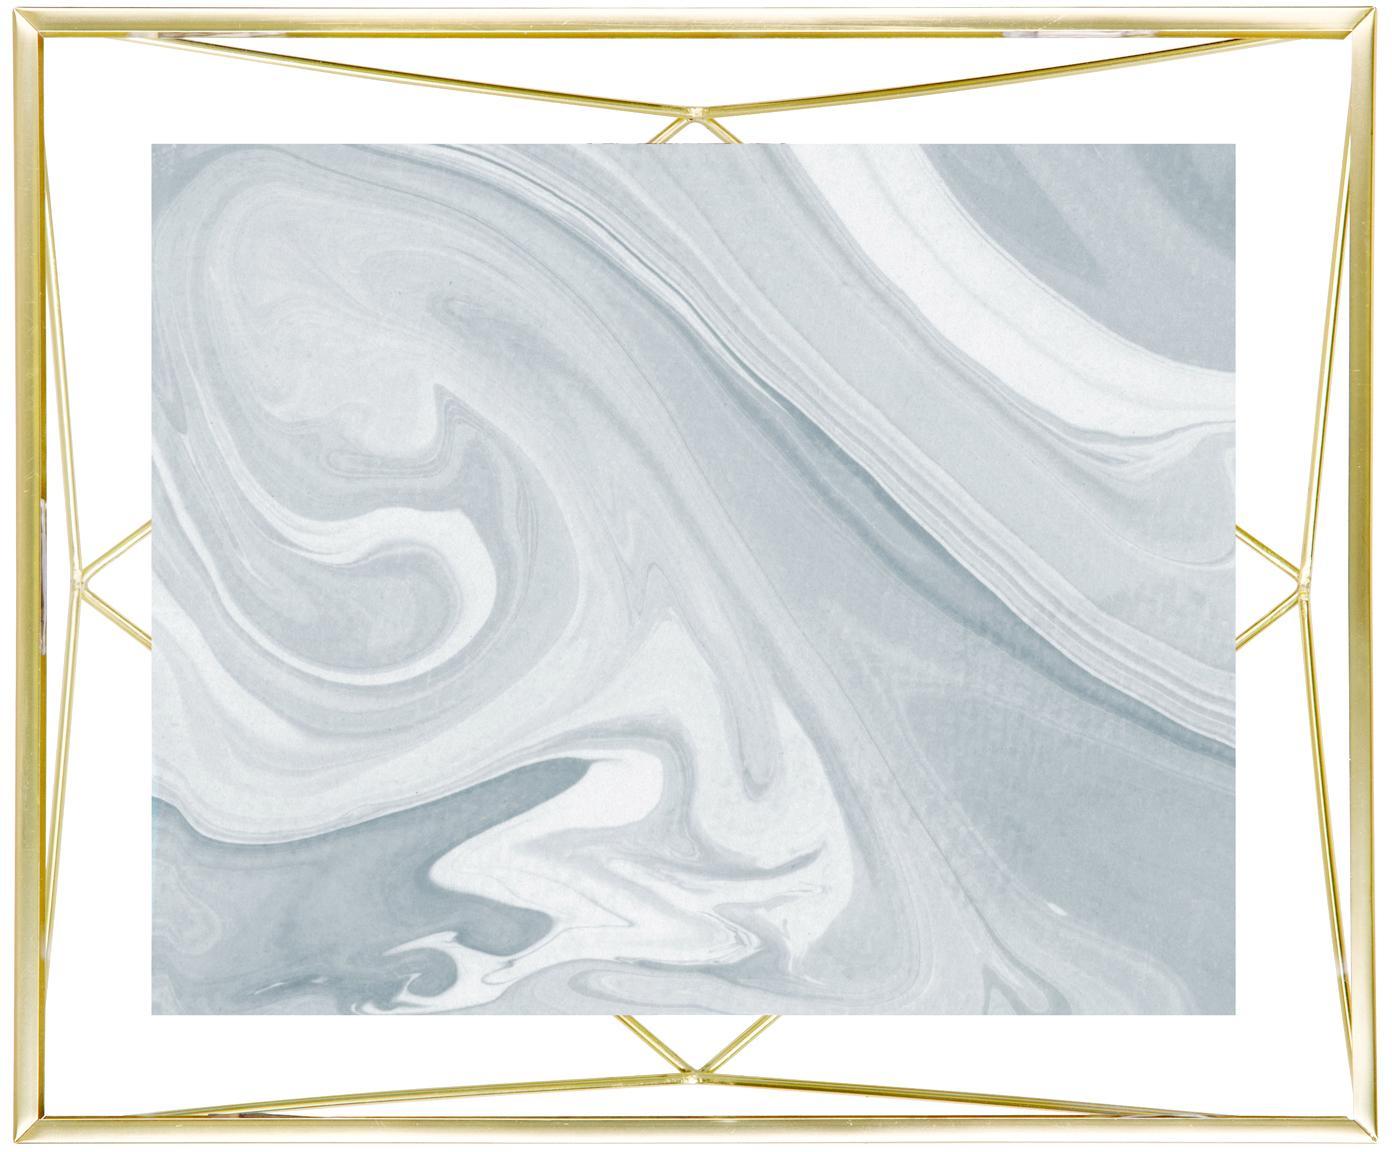 Bilderrahmen Prisma, Rahmen: Stahl, Front: Glas, Messingfarben, 20 x 25 cm